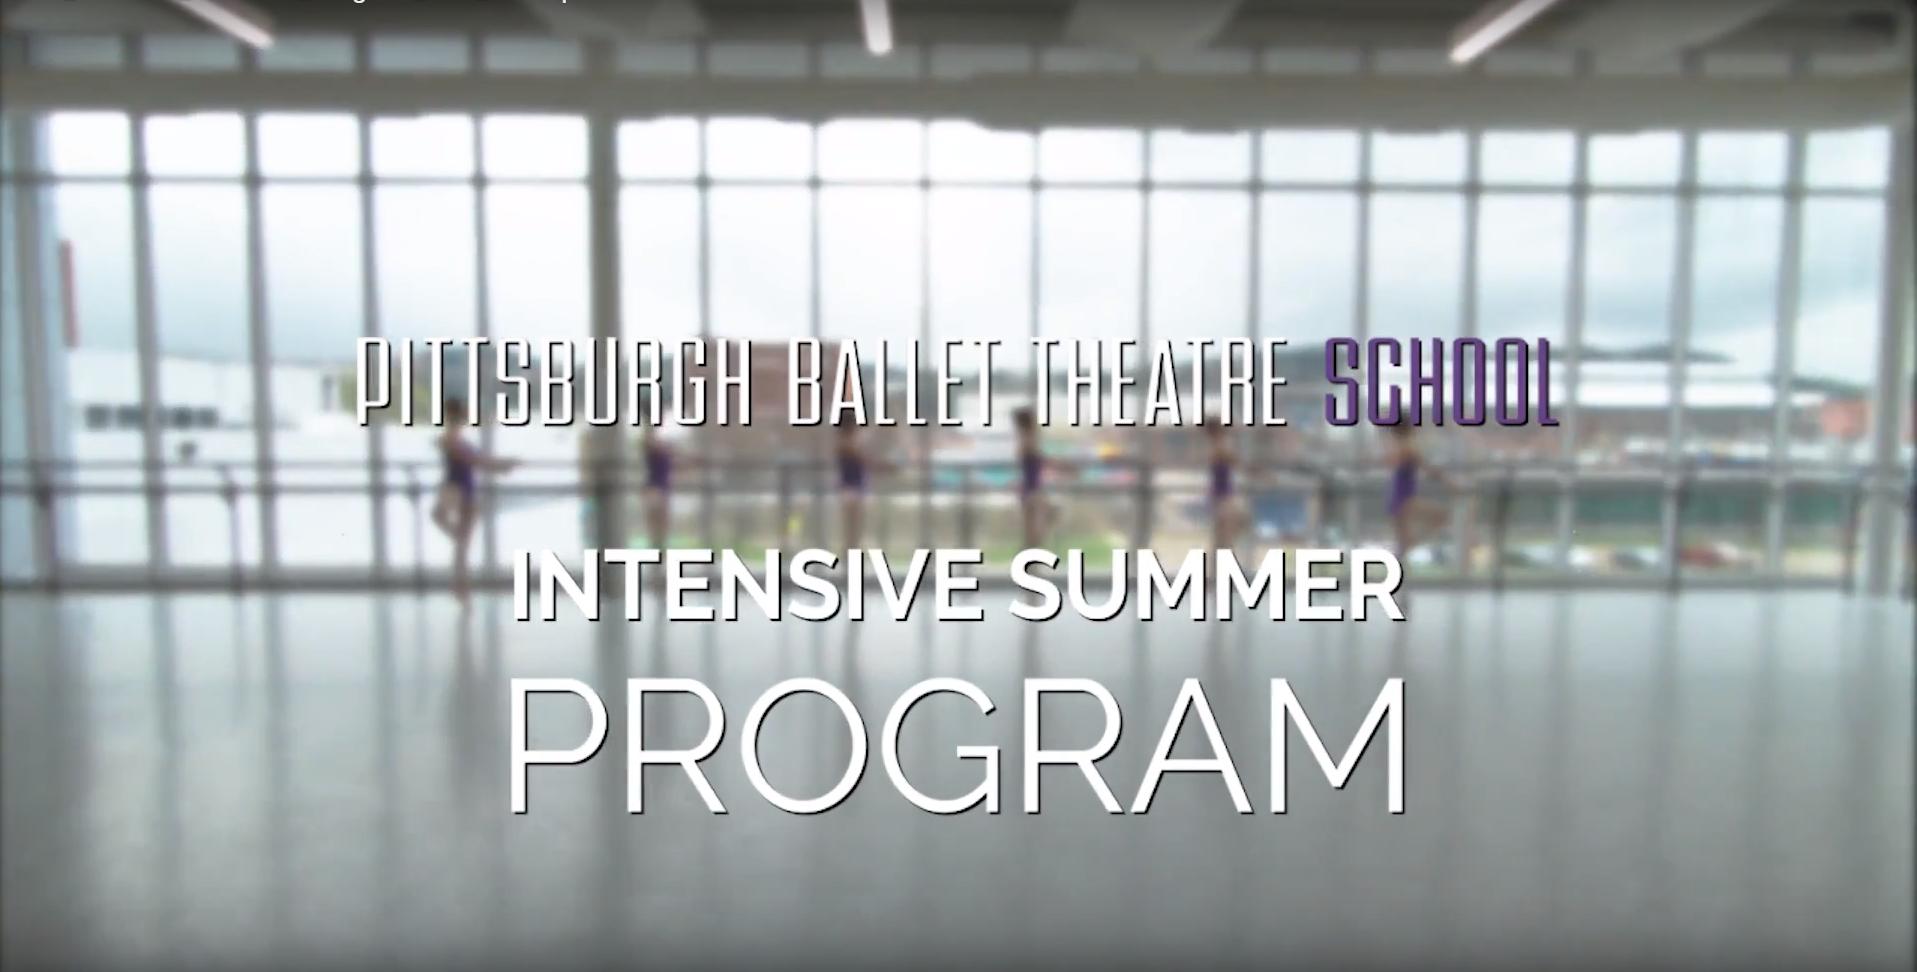 Intensive Summer Program at Pittsburgh Ballet Theatre